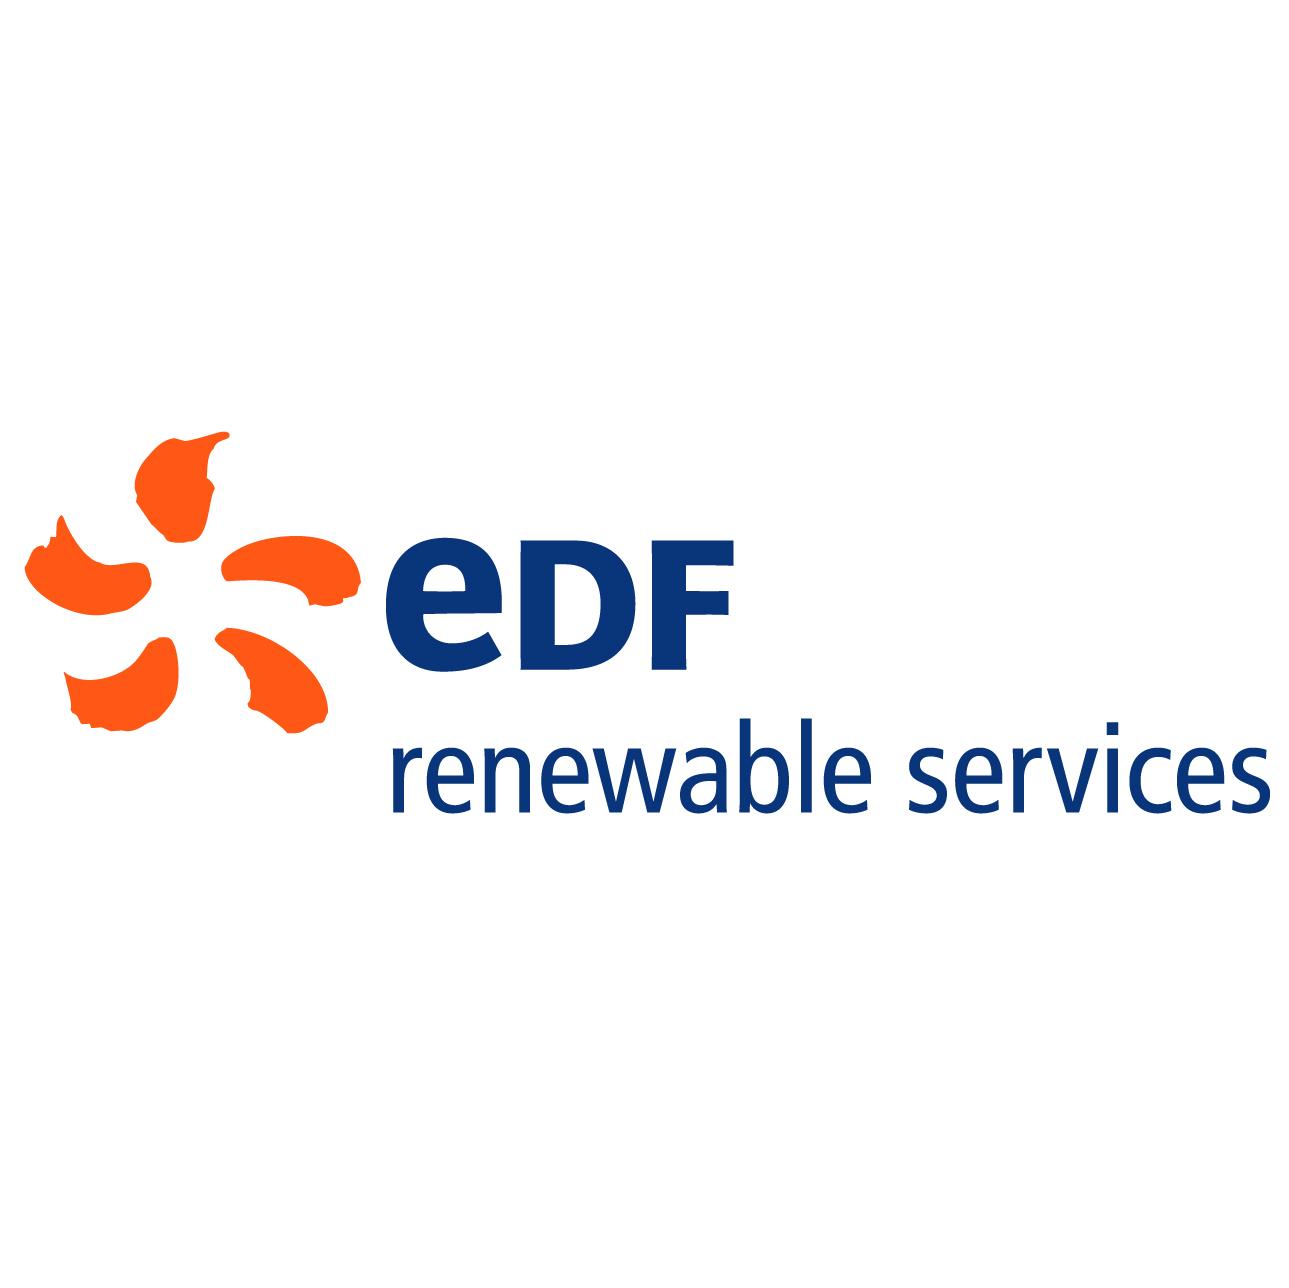 Mainstream renewables